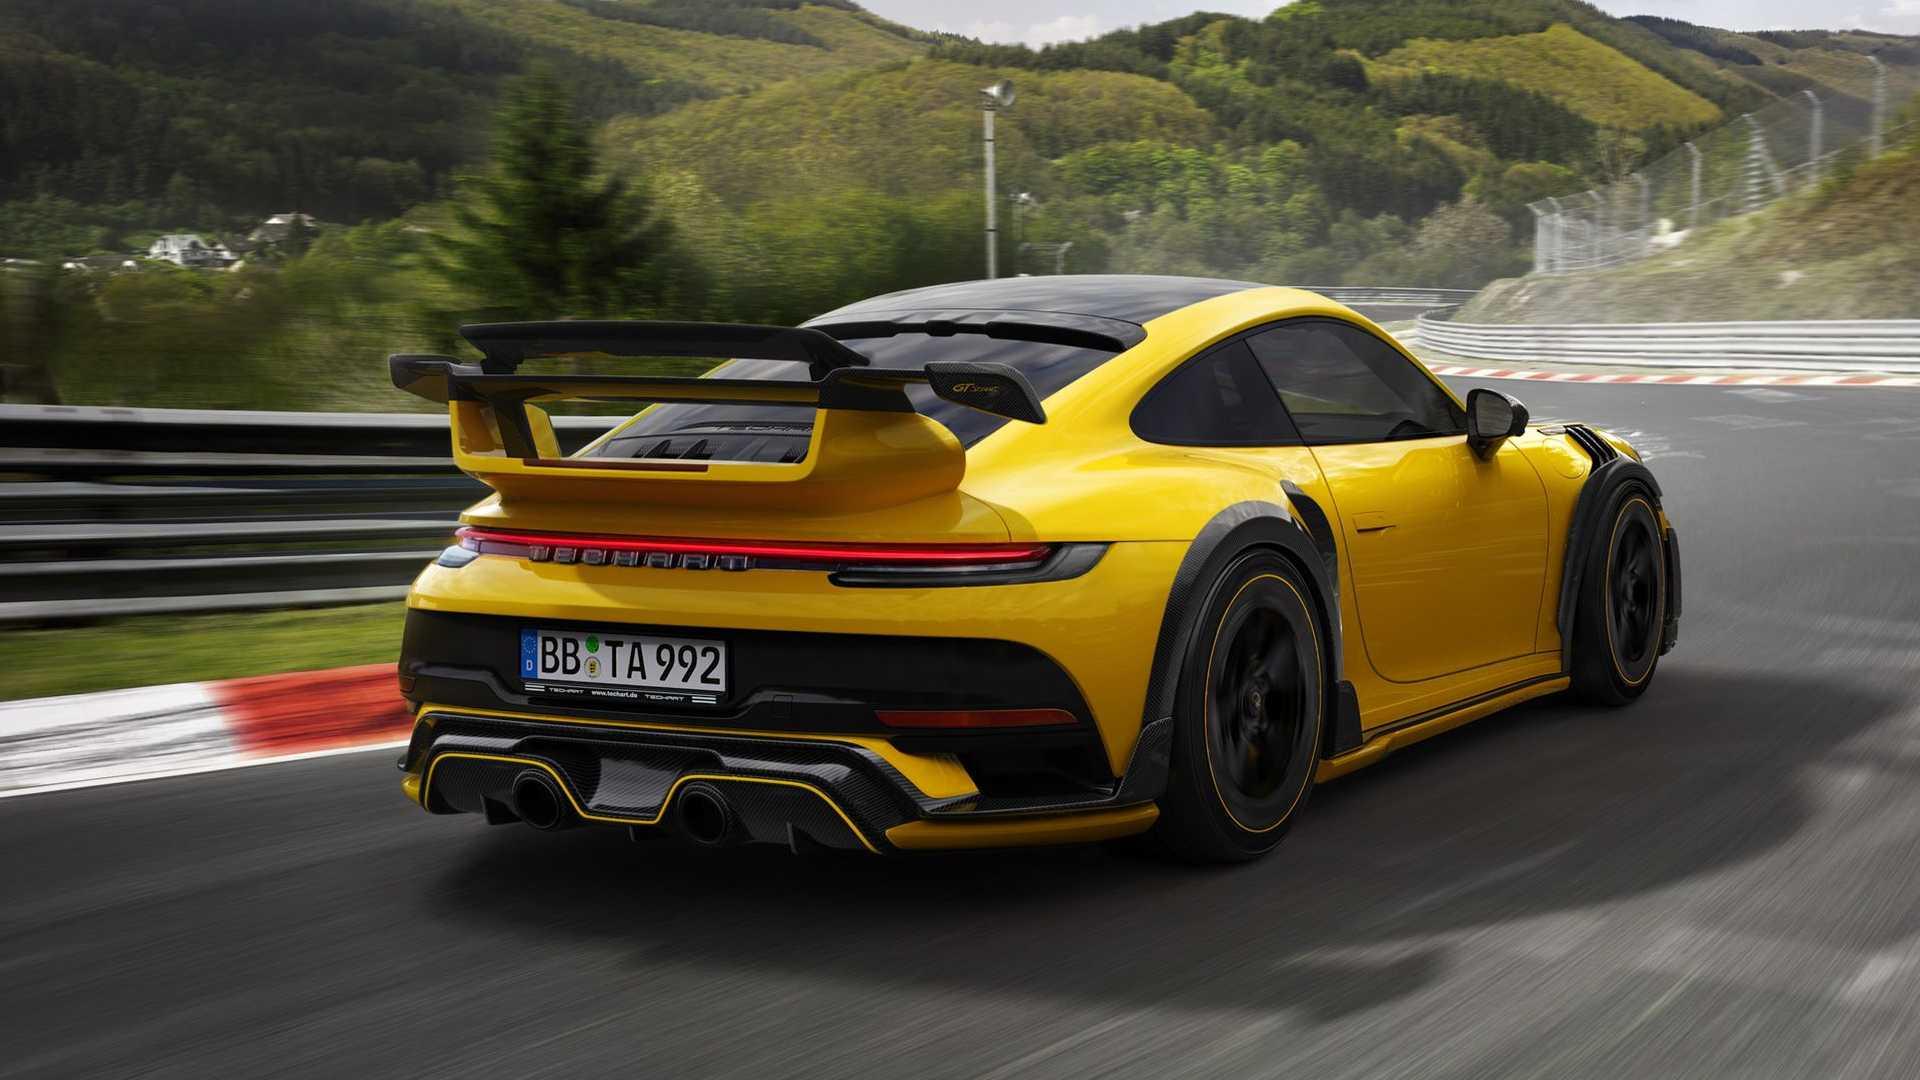 TechArt превратил новый суперкар Porsche 911 GT2 RS в дерзкий GTstreet R